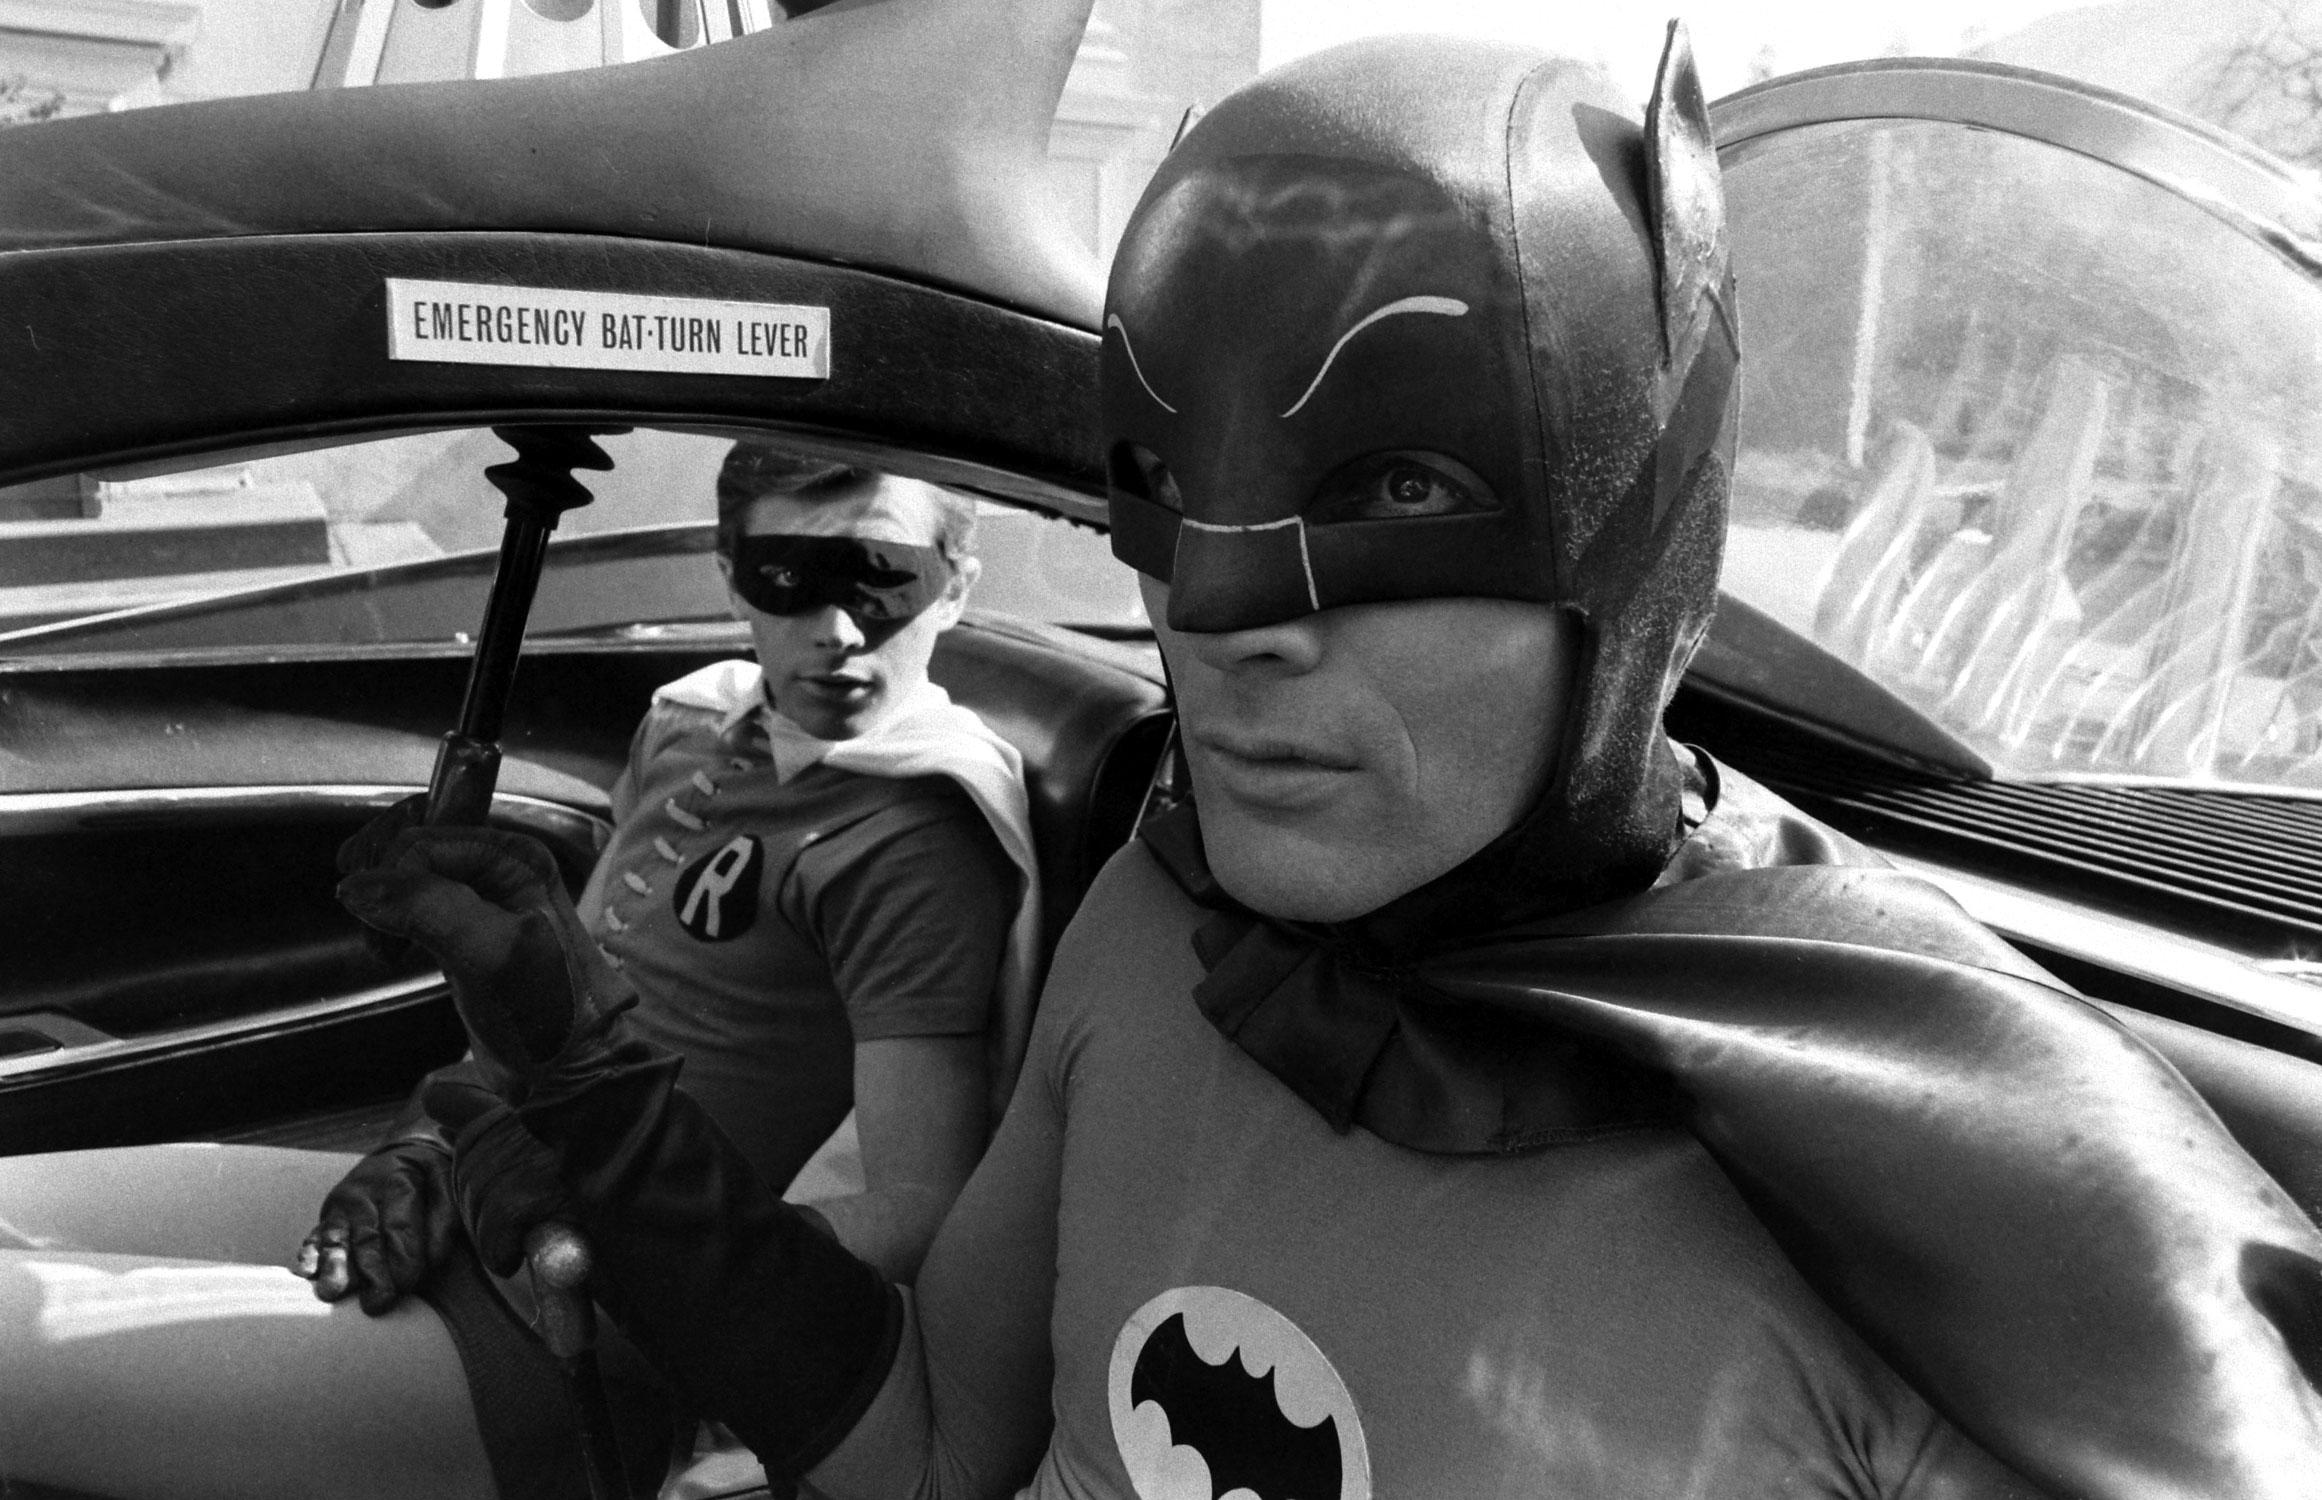 Adam West (Batman) and Burt Ward (Robin) on the set of Batman, 1966.